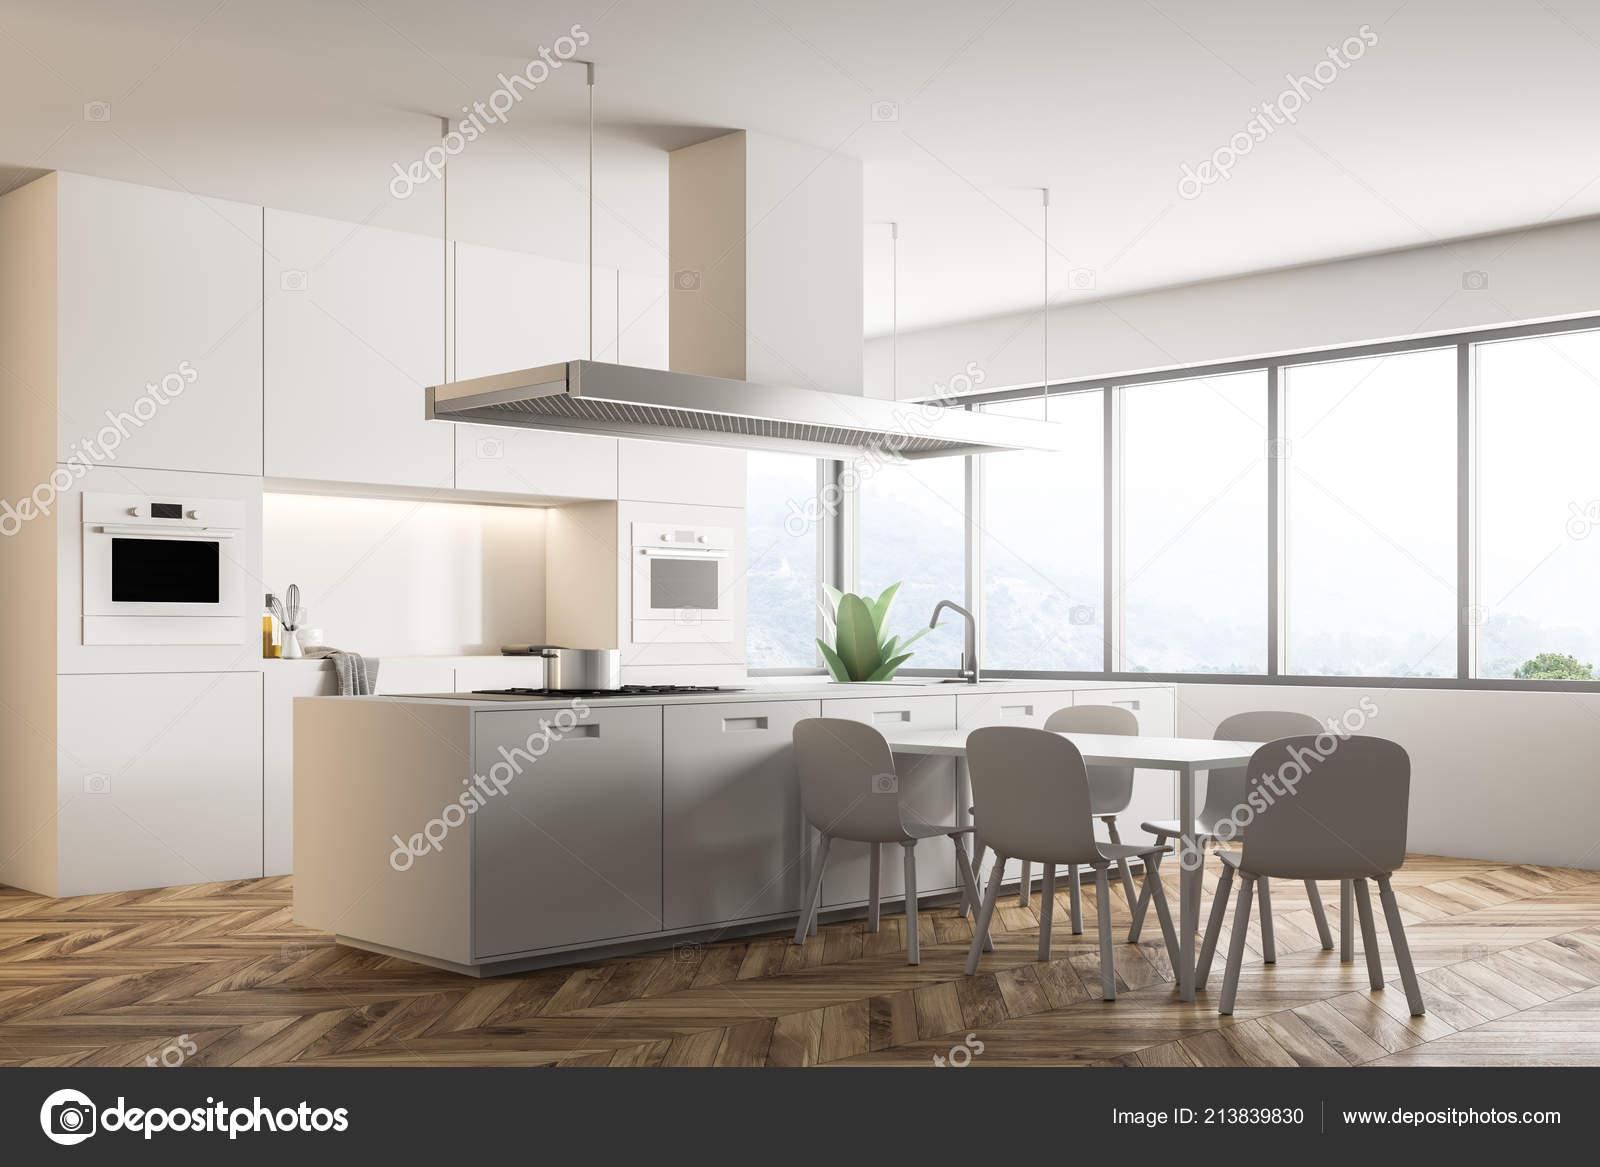 kitchen table nook rent to own homes in kitchener 现代厨房的角落里有白色的墙壁木地板大窗户一个白色的小岛和台面还有一张 现代厨房的角落里有白色的墙壁 木地板 大窗户 一个白色的小岛和台面 还有一张带有椅子的餐桌 3d 渲染模拟 照片作者denisismagilov